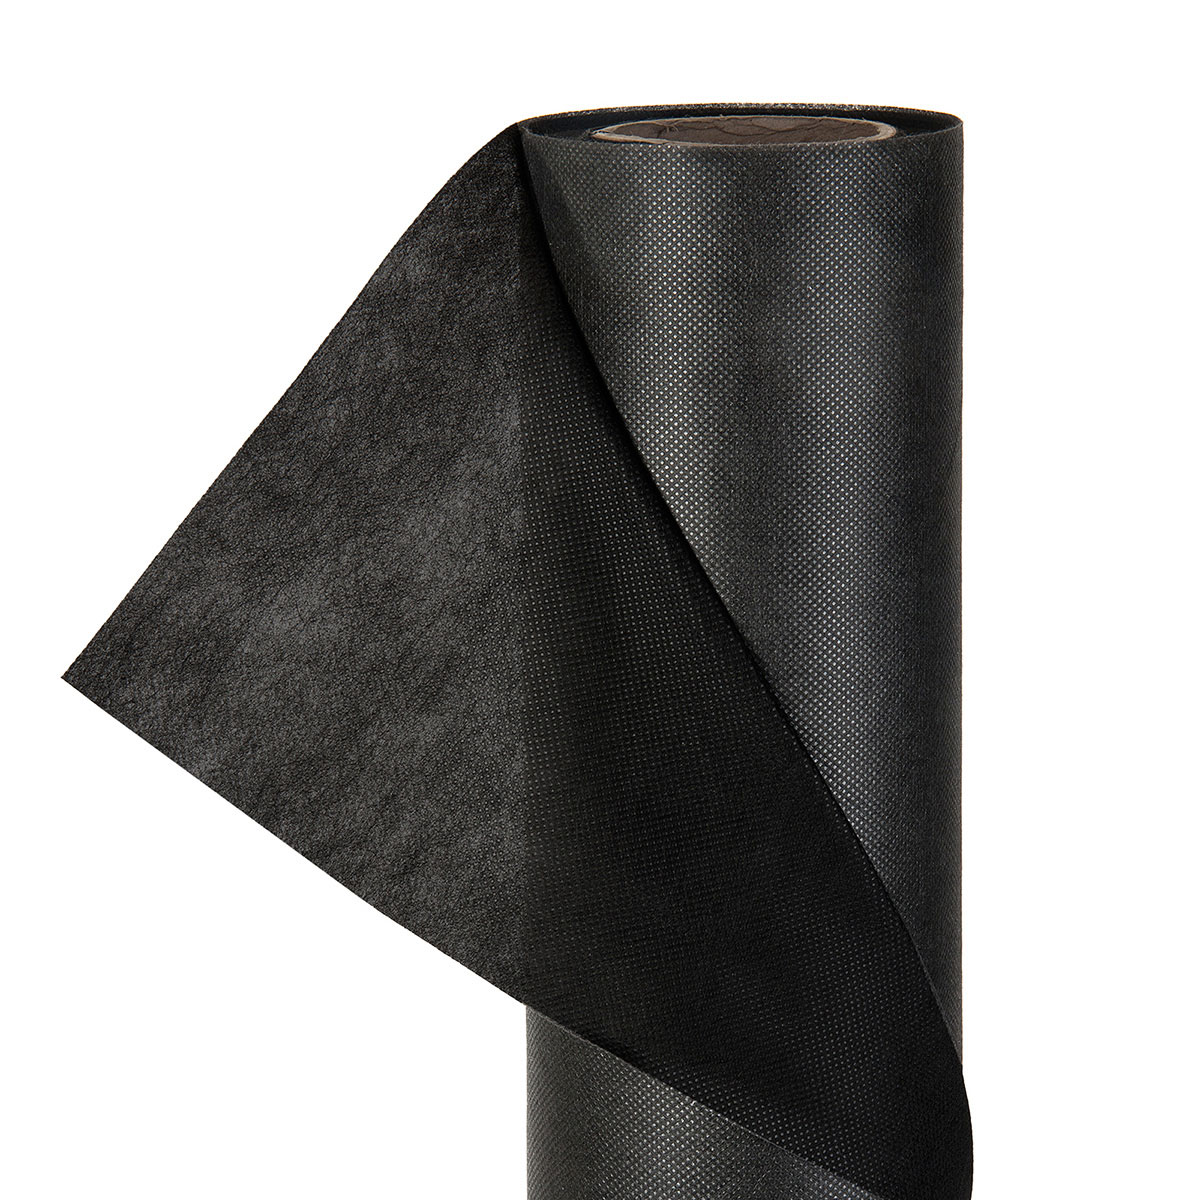 rei festes unkrautvlies unkrautflies uv stabilisiert gegen unkraut 50g 15mx1 2m ebay. Black Bedroom Furniture Sets. Home Design Ideas